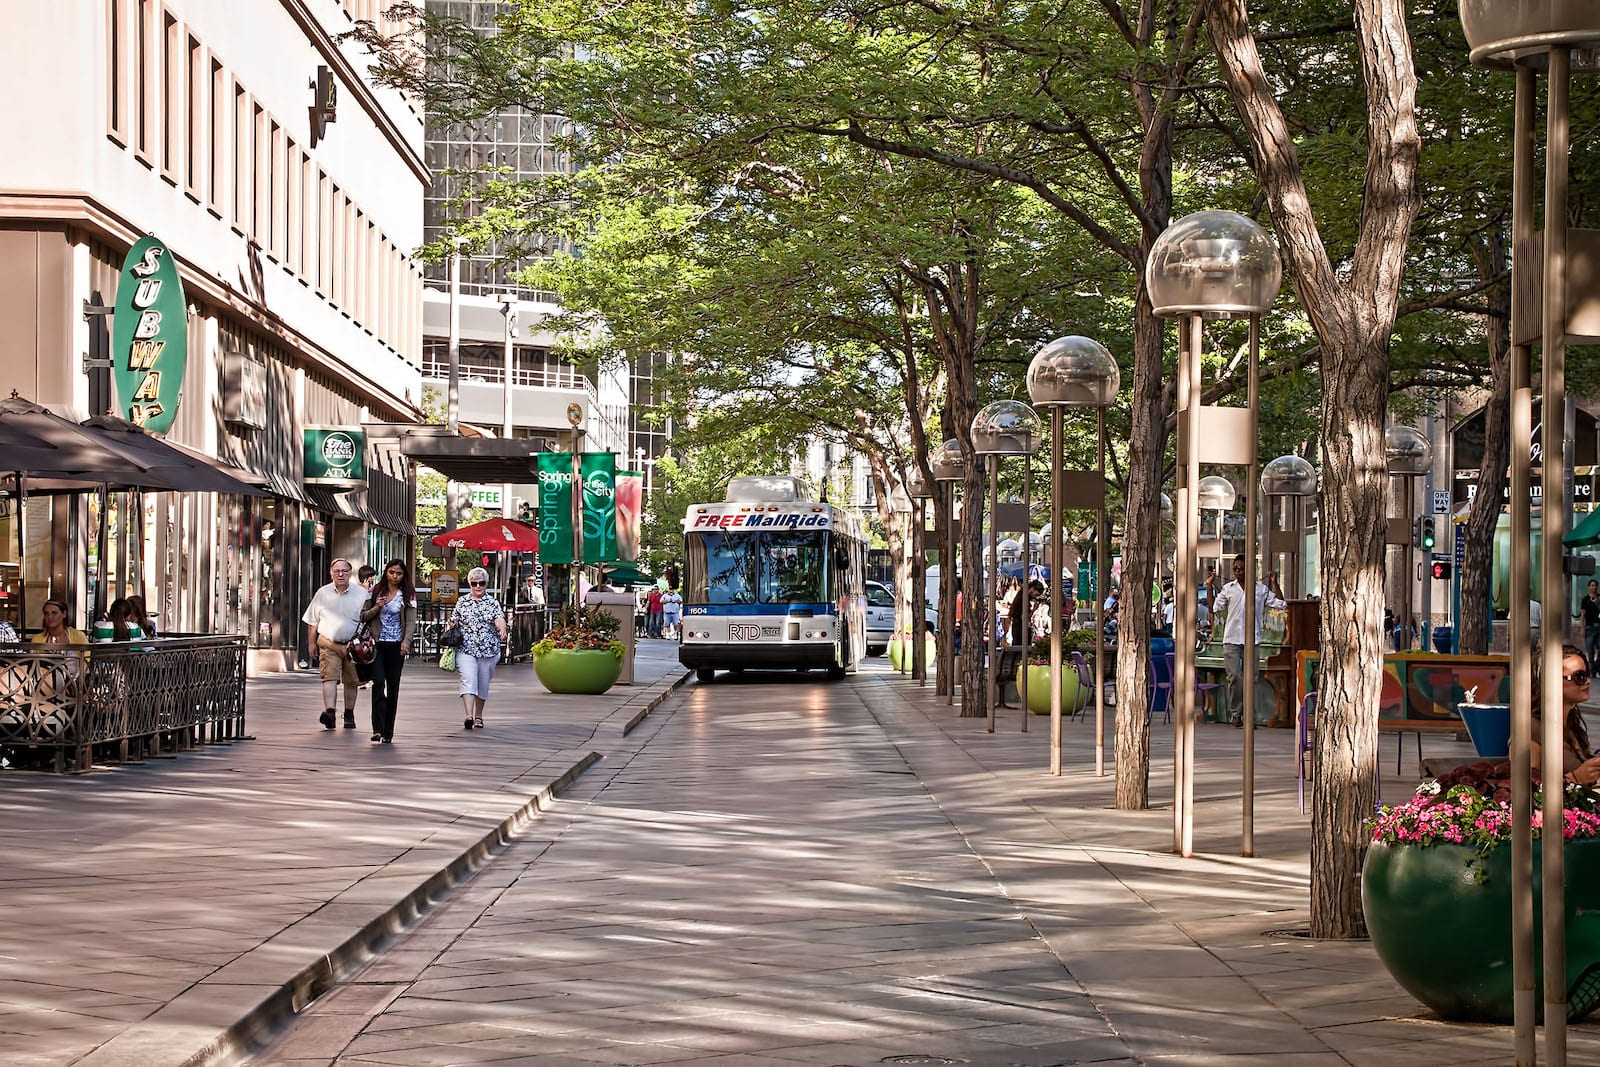 Free 16th Street Mall Bus Ride, CO